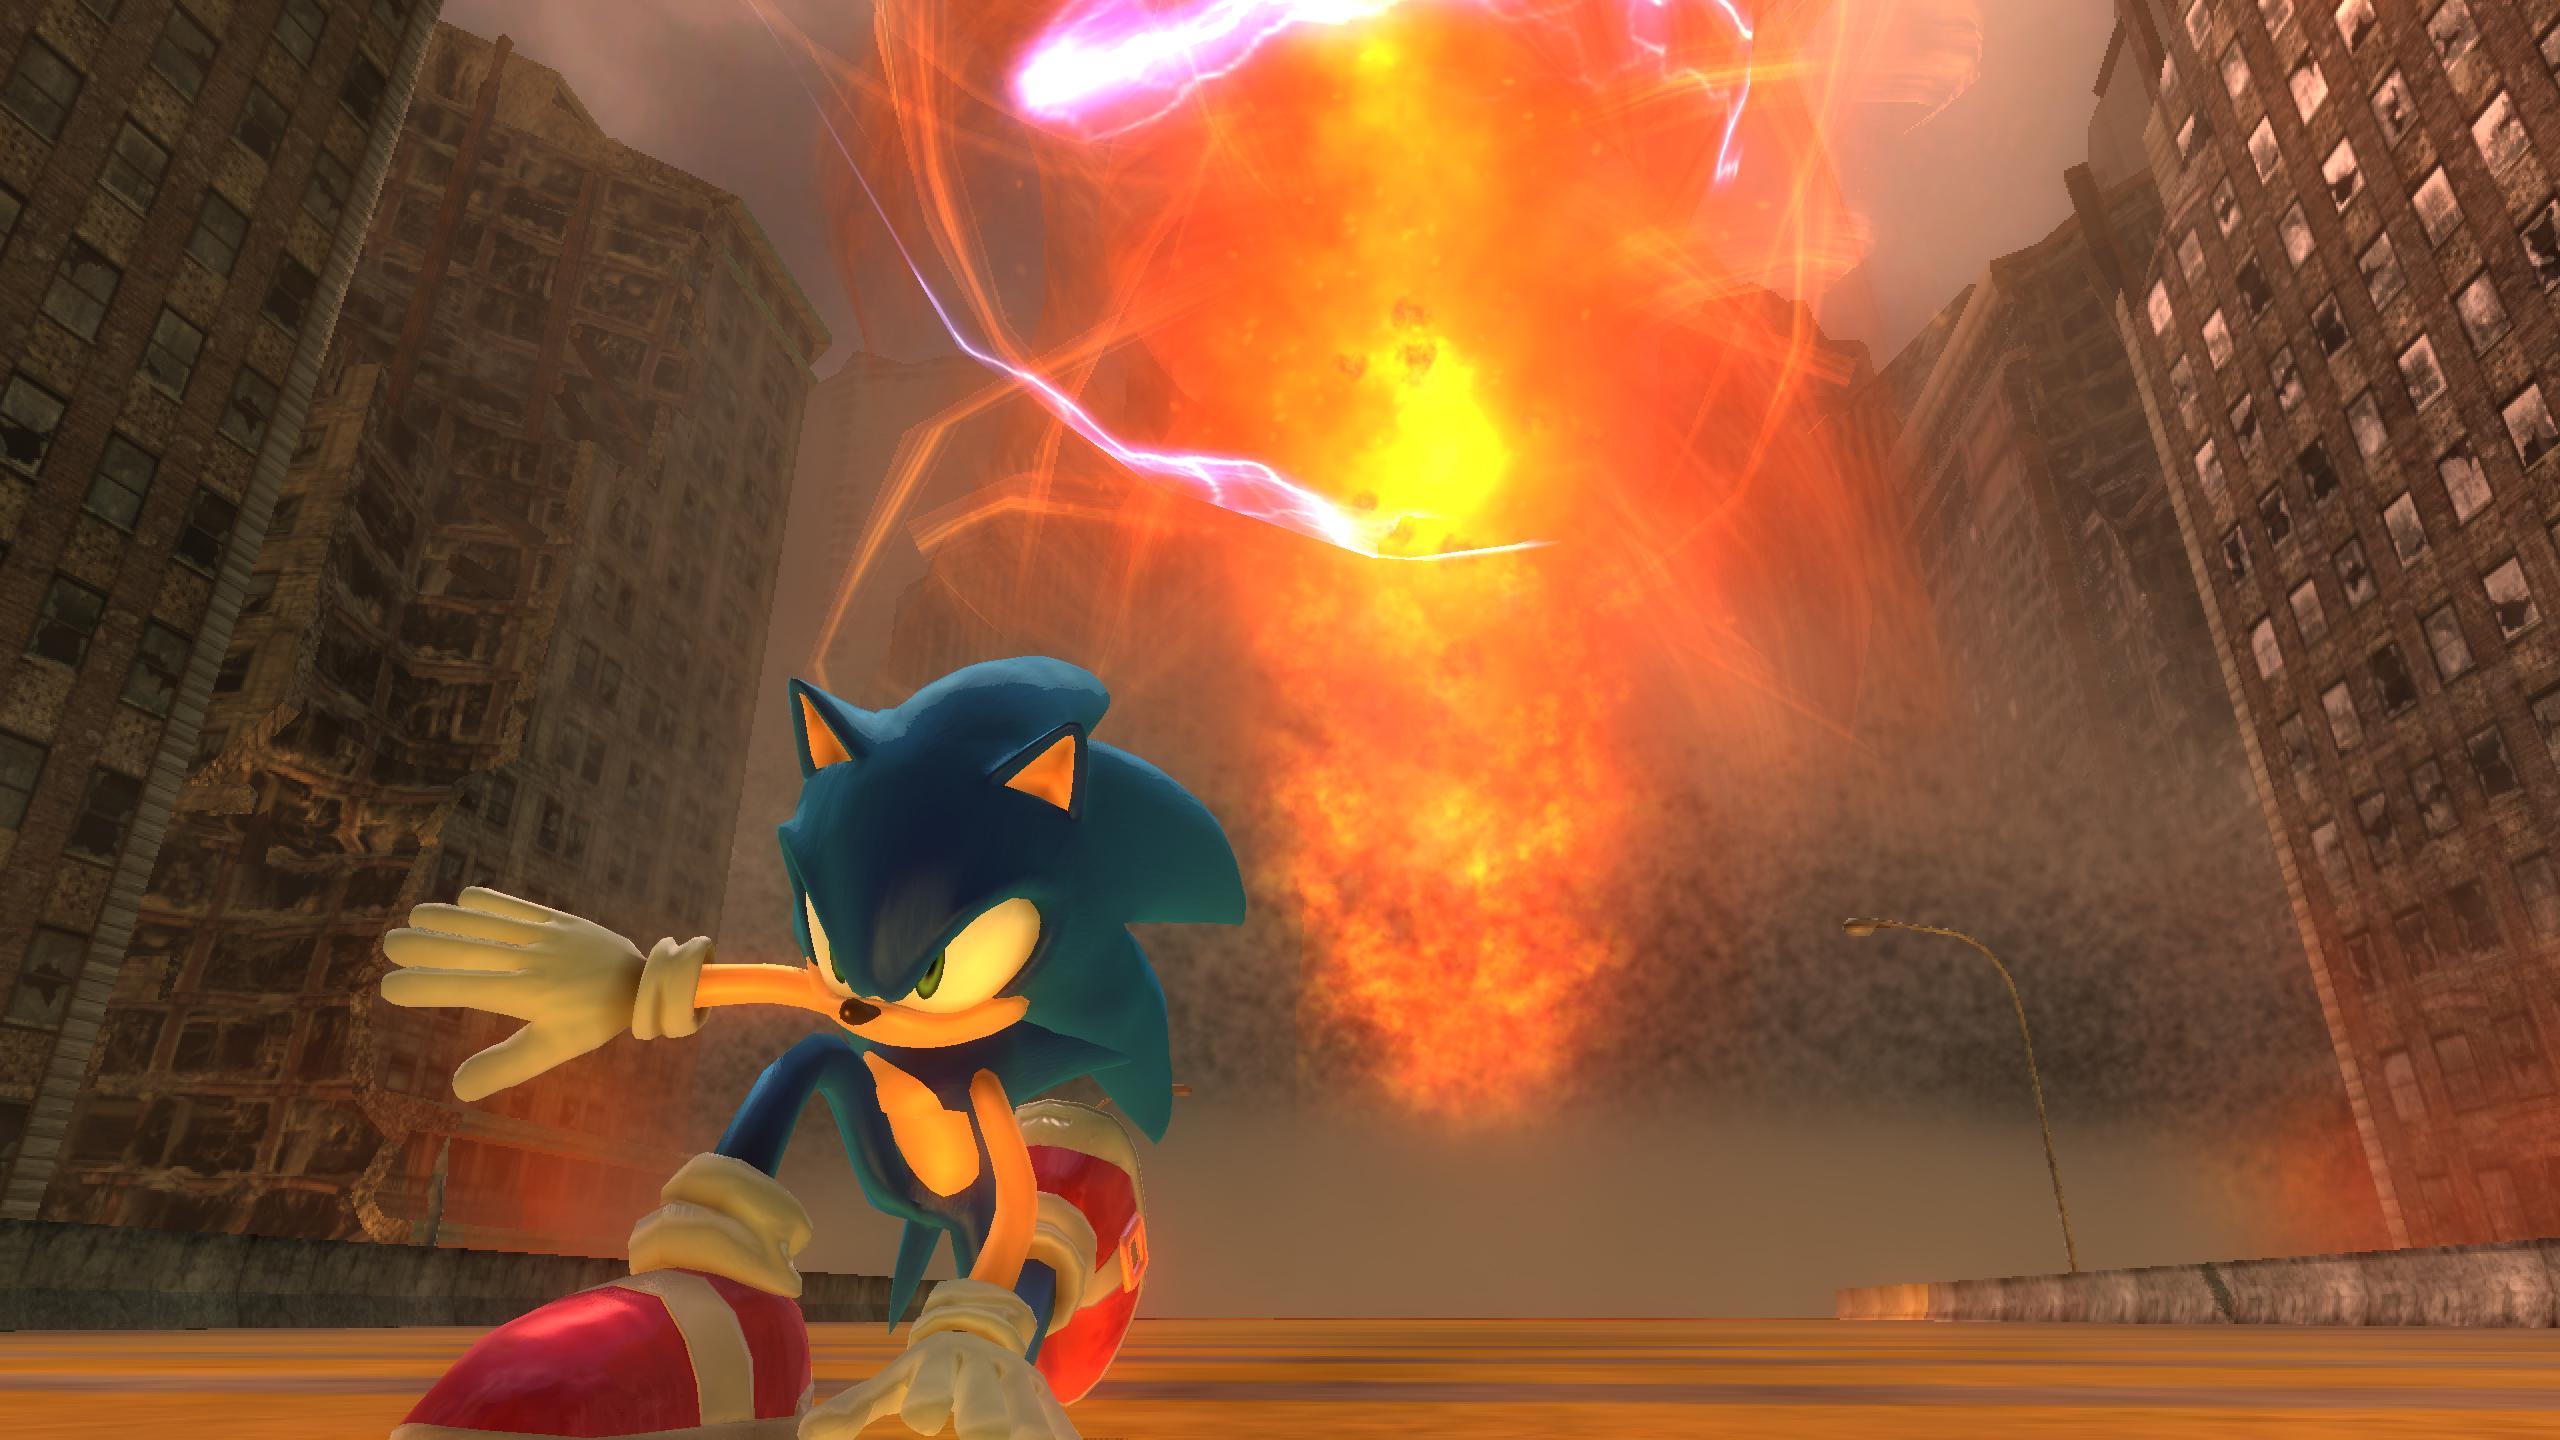 File:Sonic06screen46.jpg